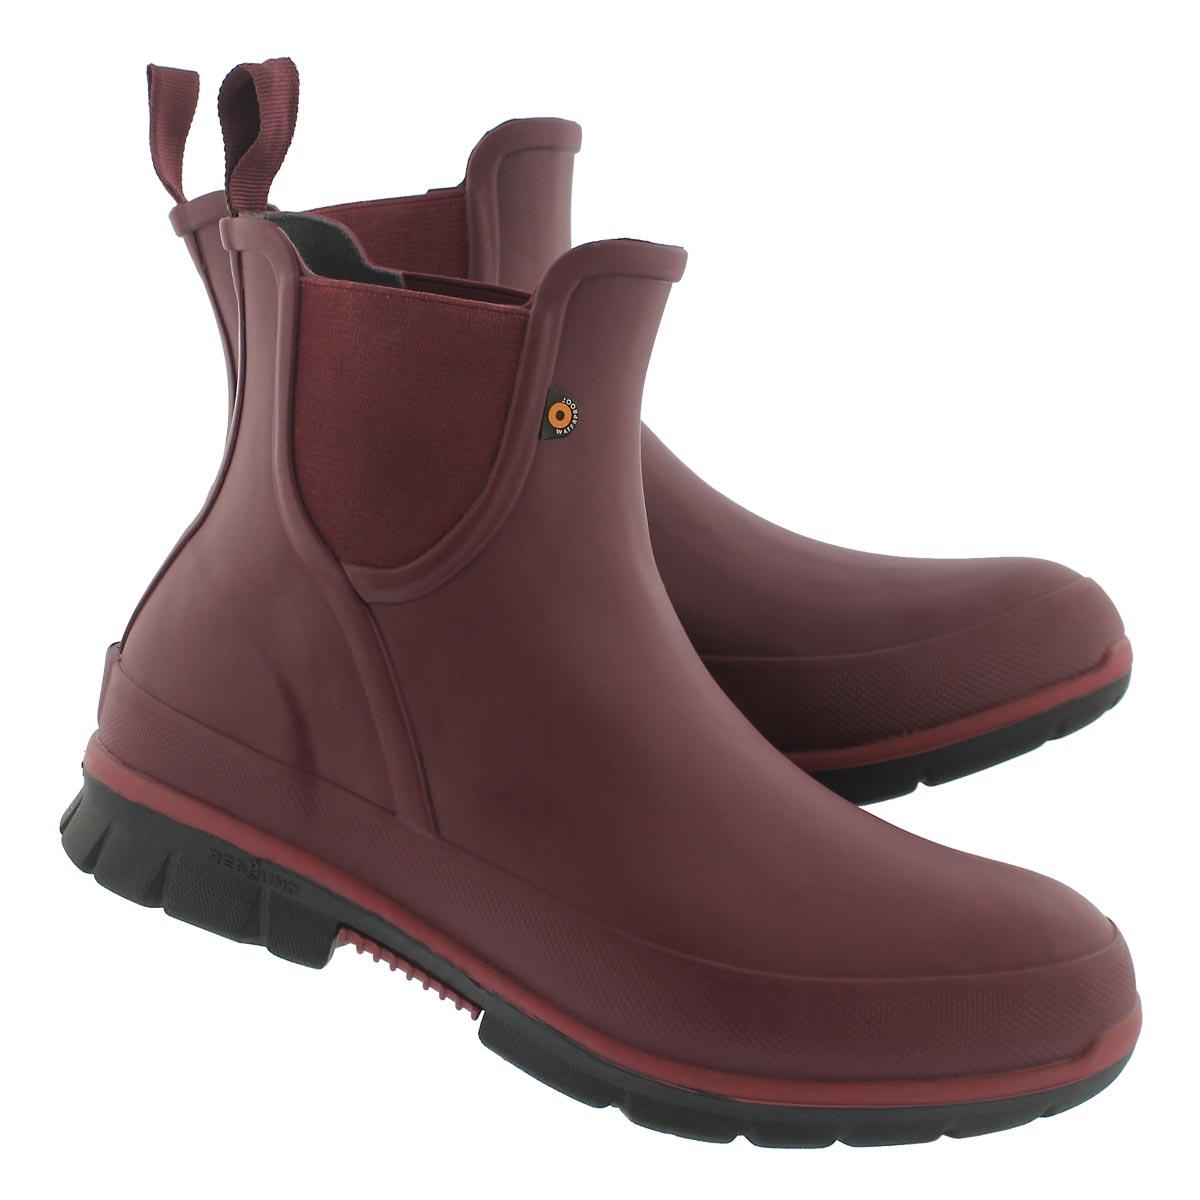 Lds Amanda burg wtpf low rain boot